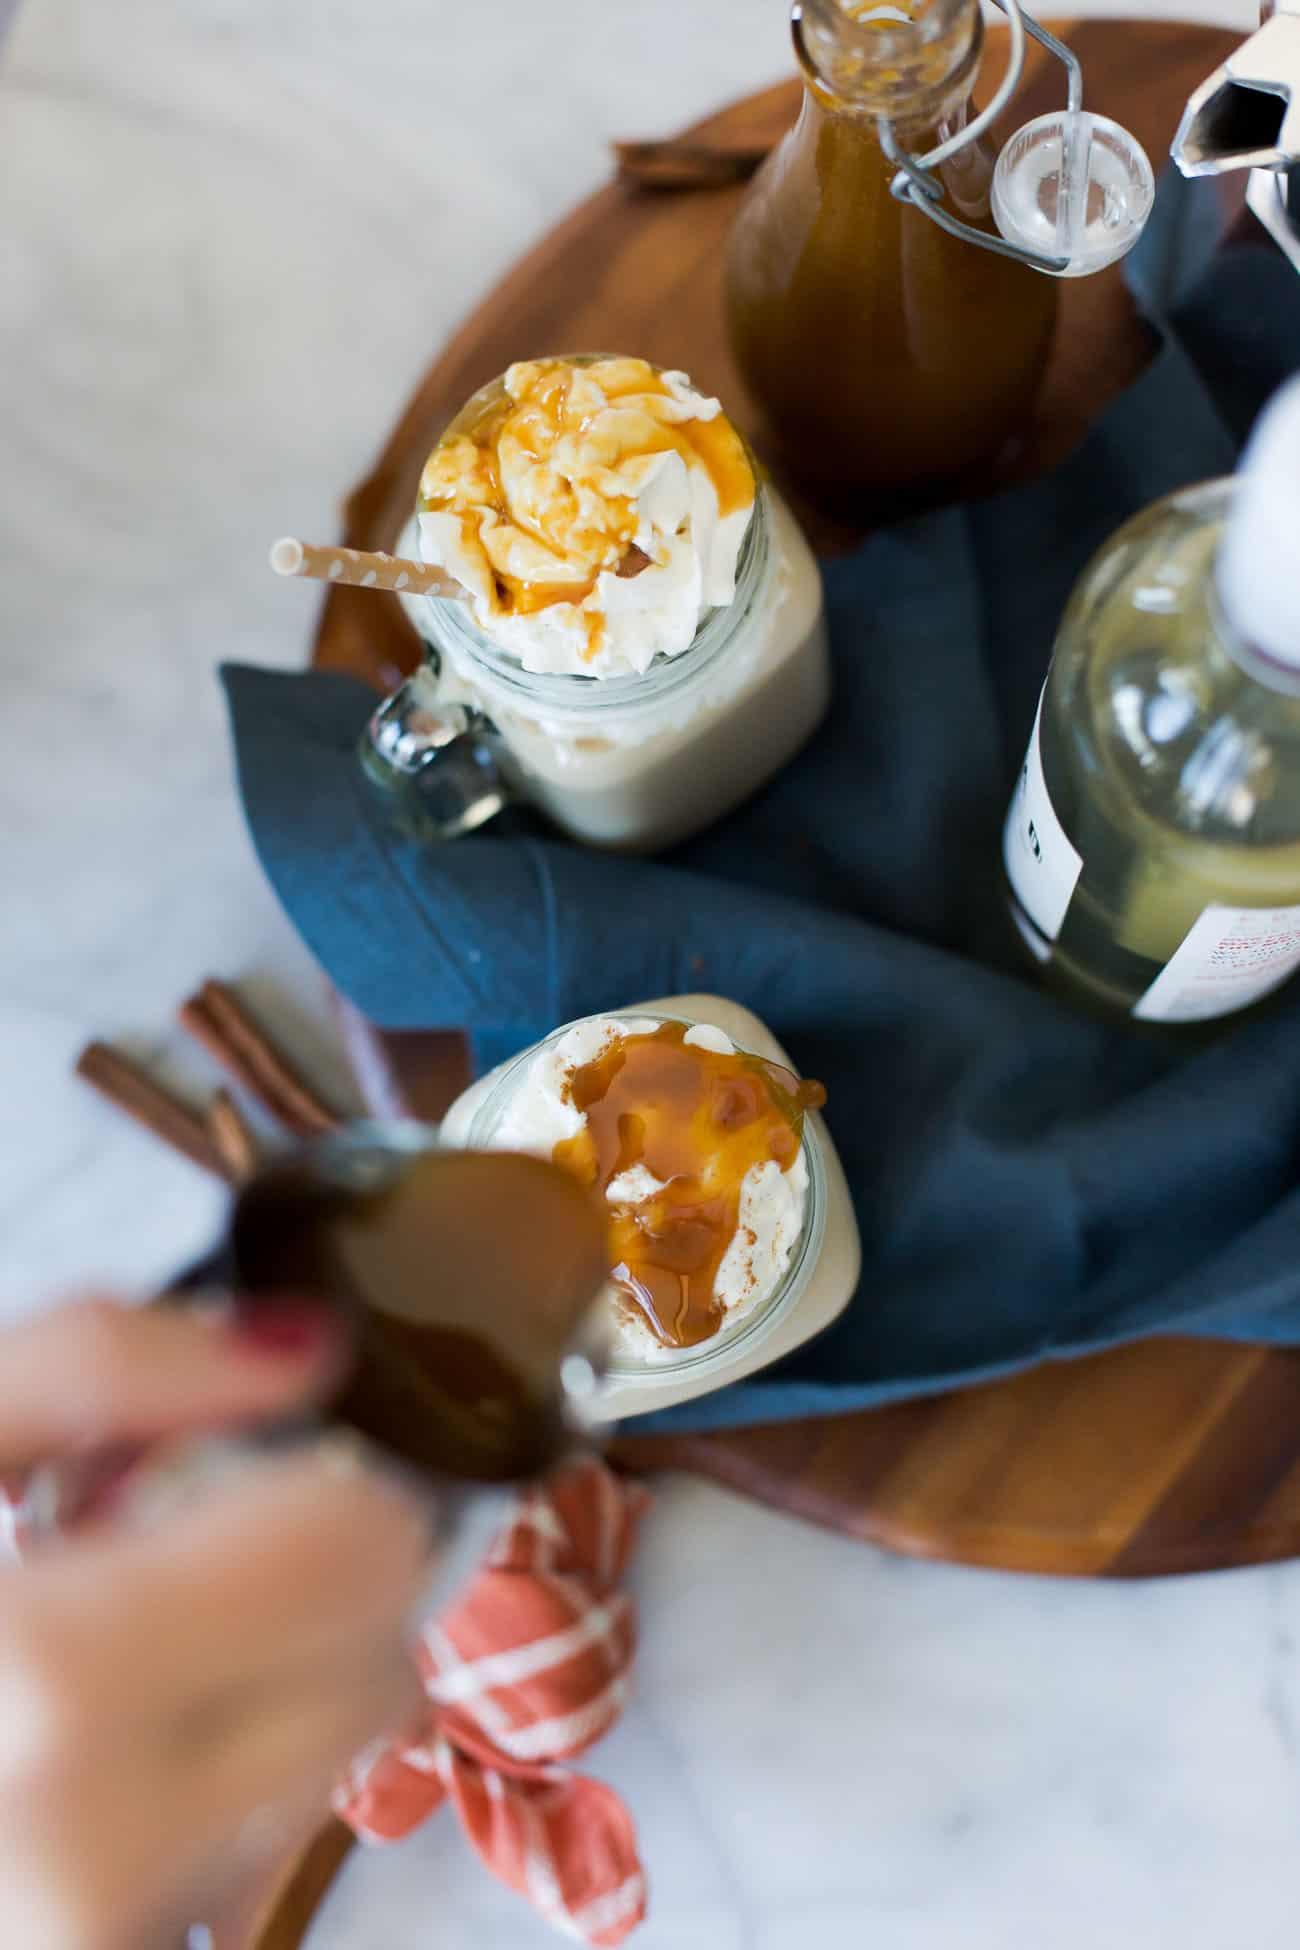 Pumpkin spice latte recipe, Starbucks PSL recipe - My Style Vita